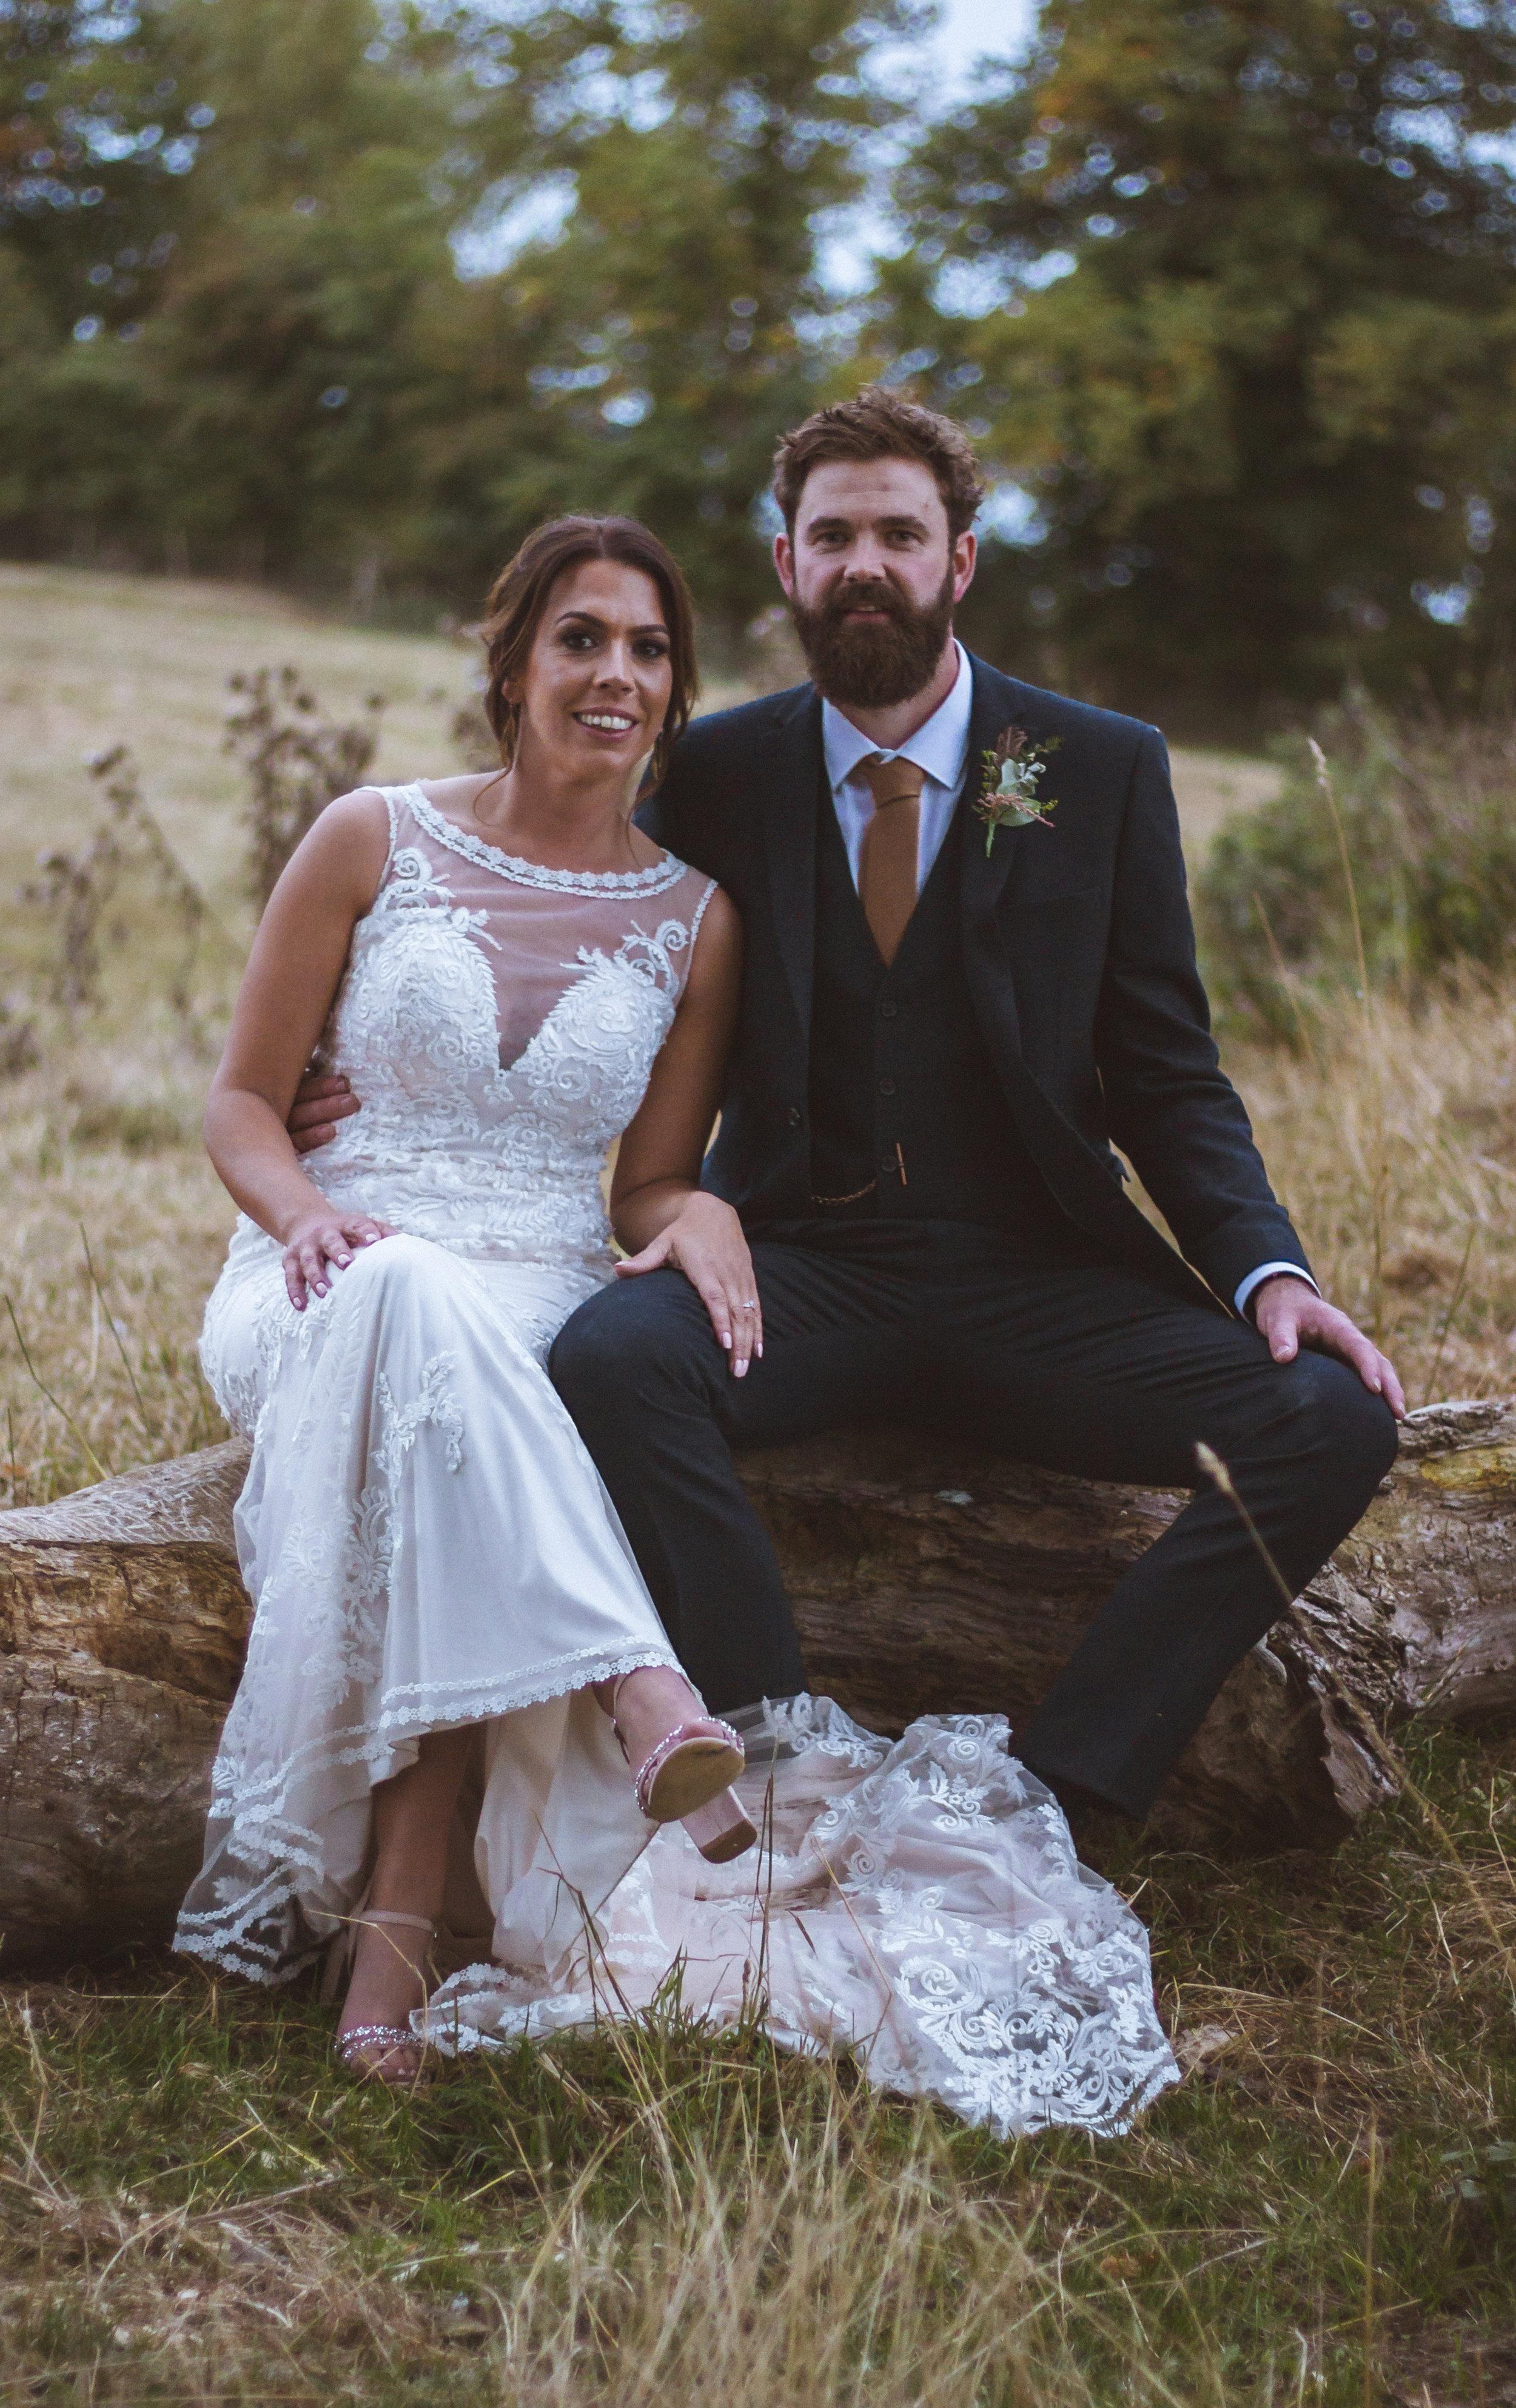 Greer & Tim's Wedding 562.jpg